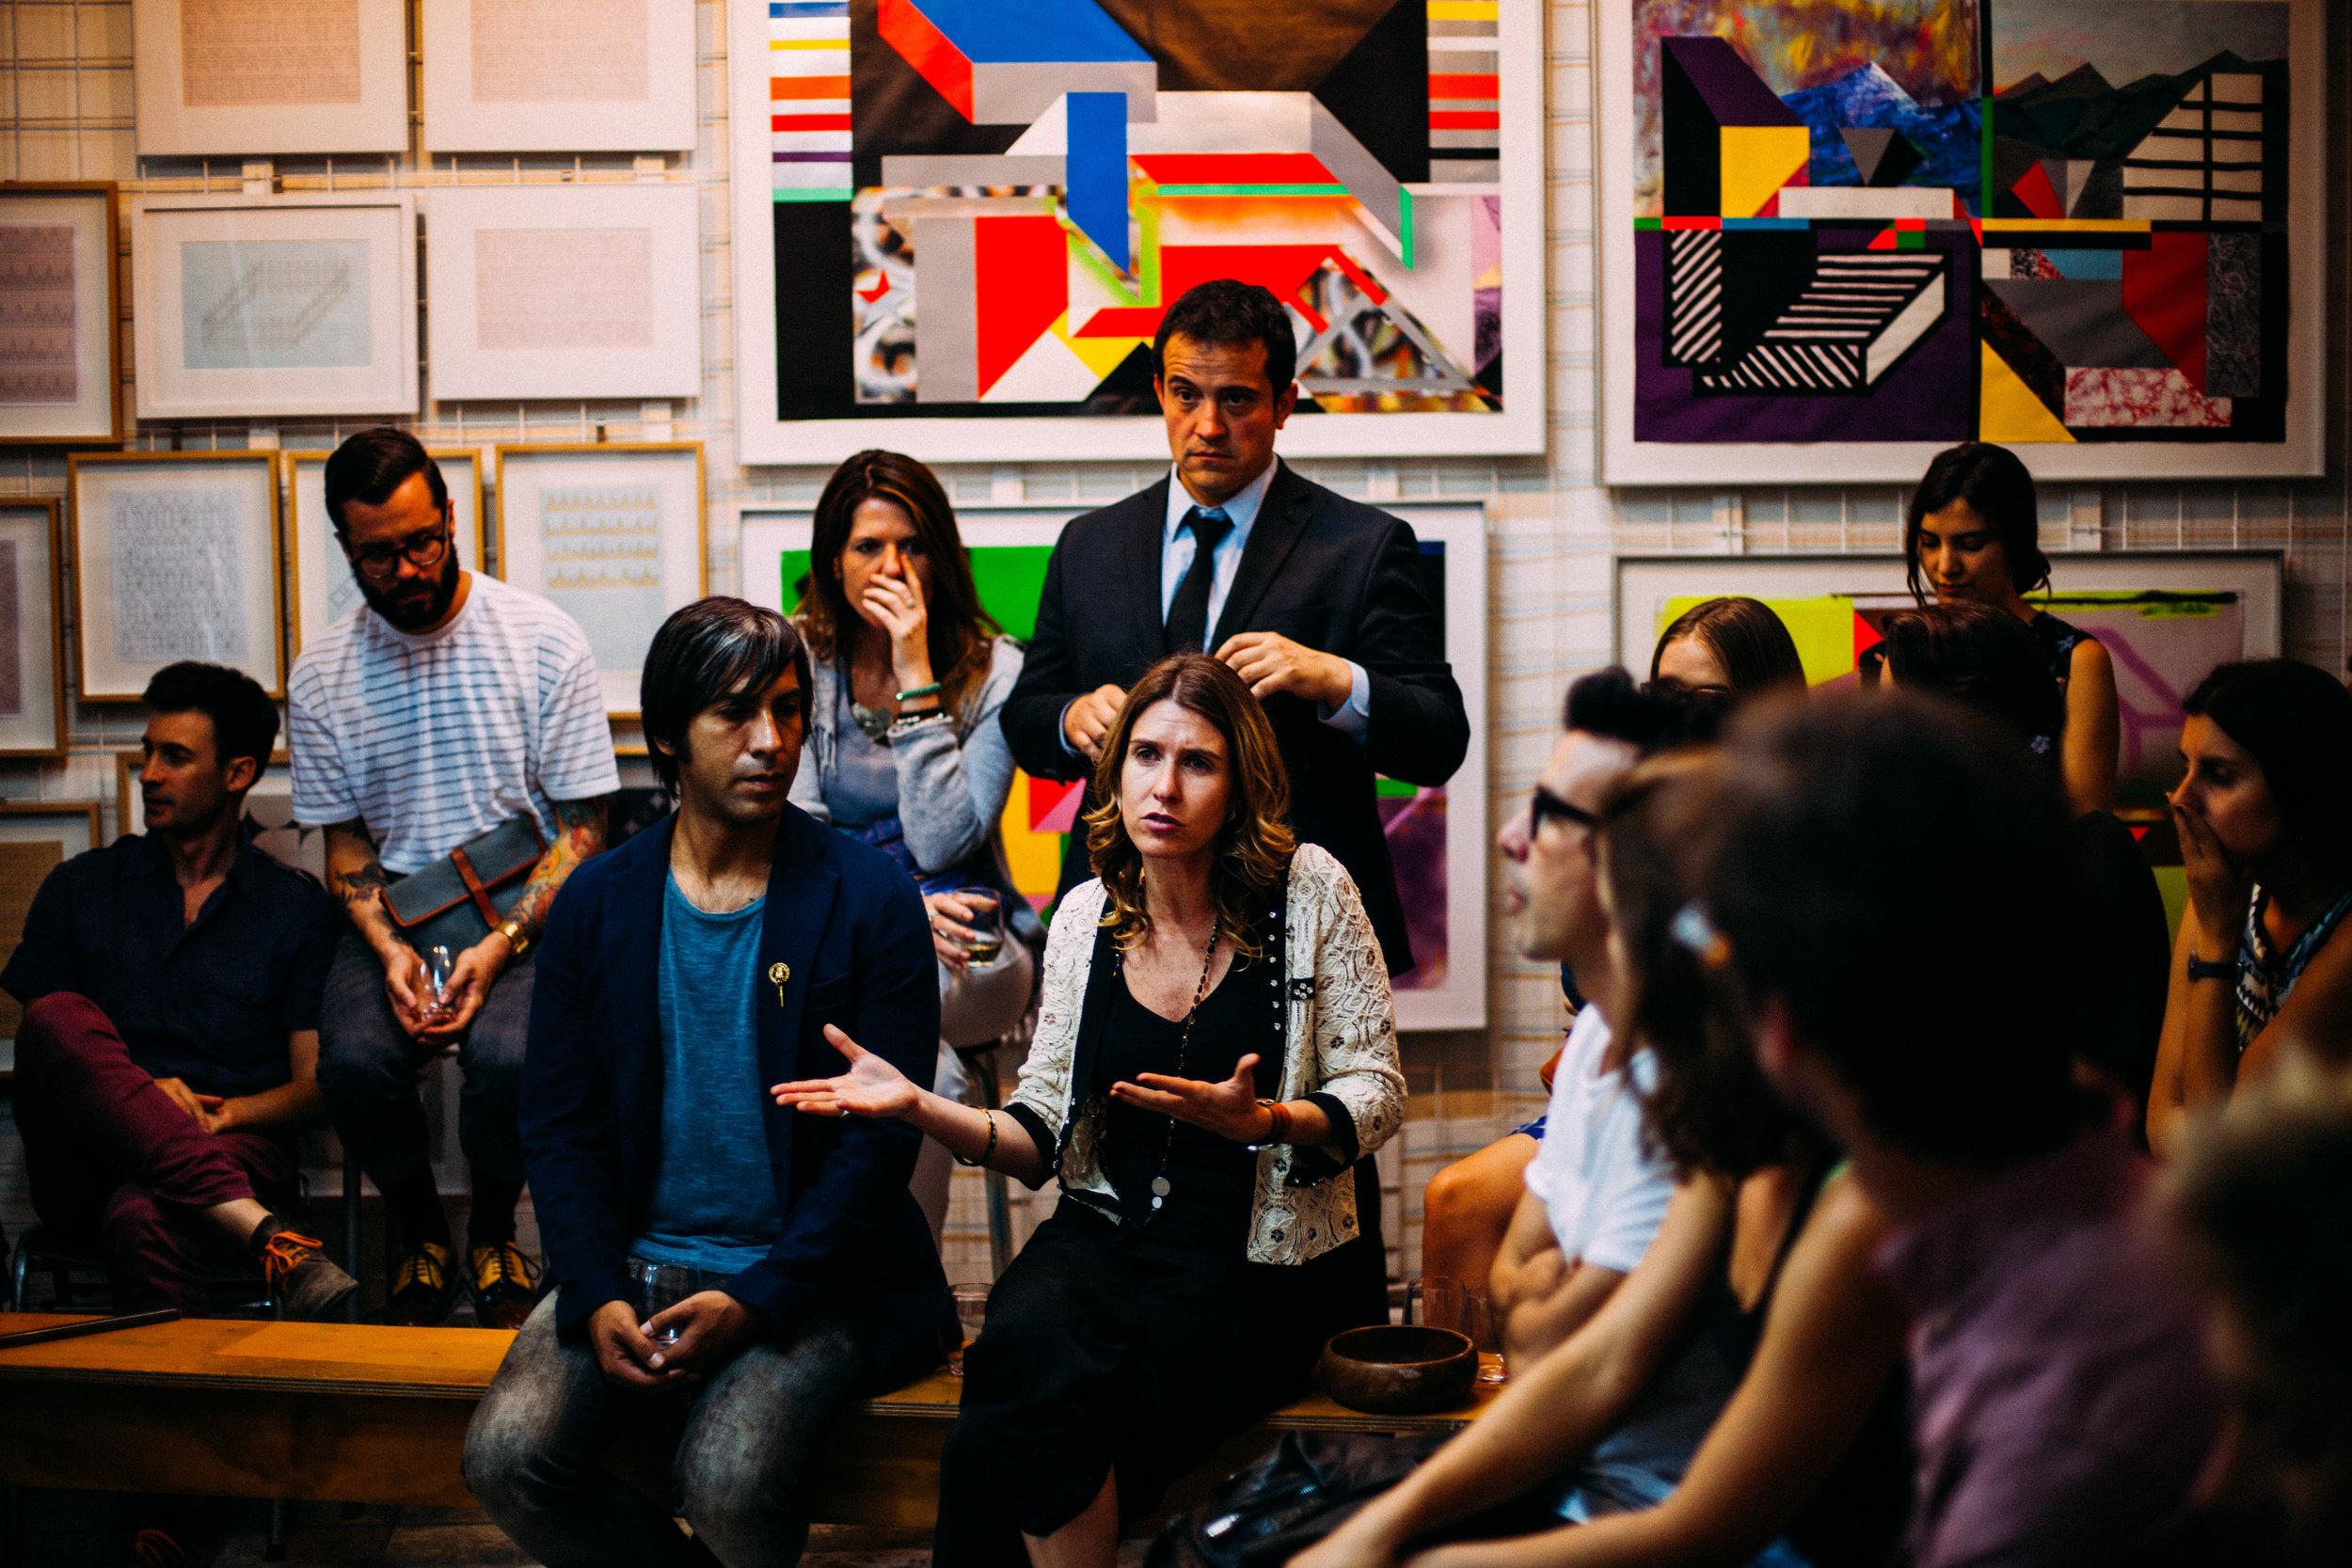 Attend public meetings -